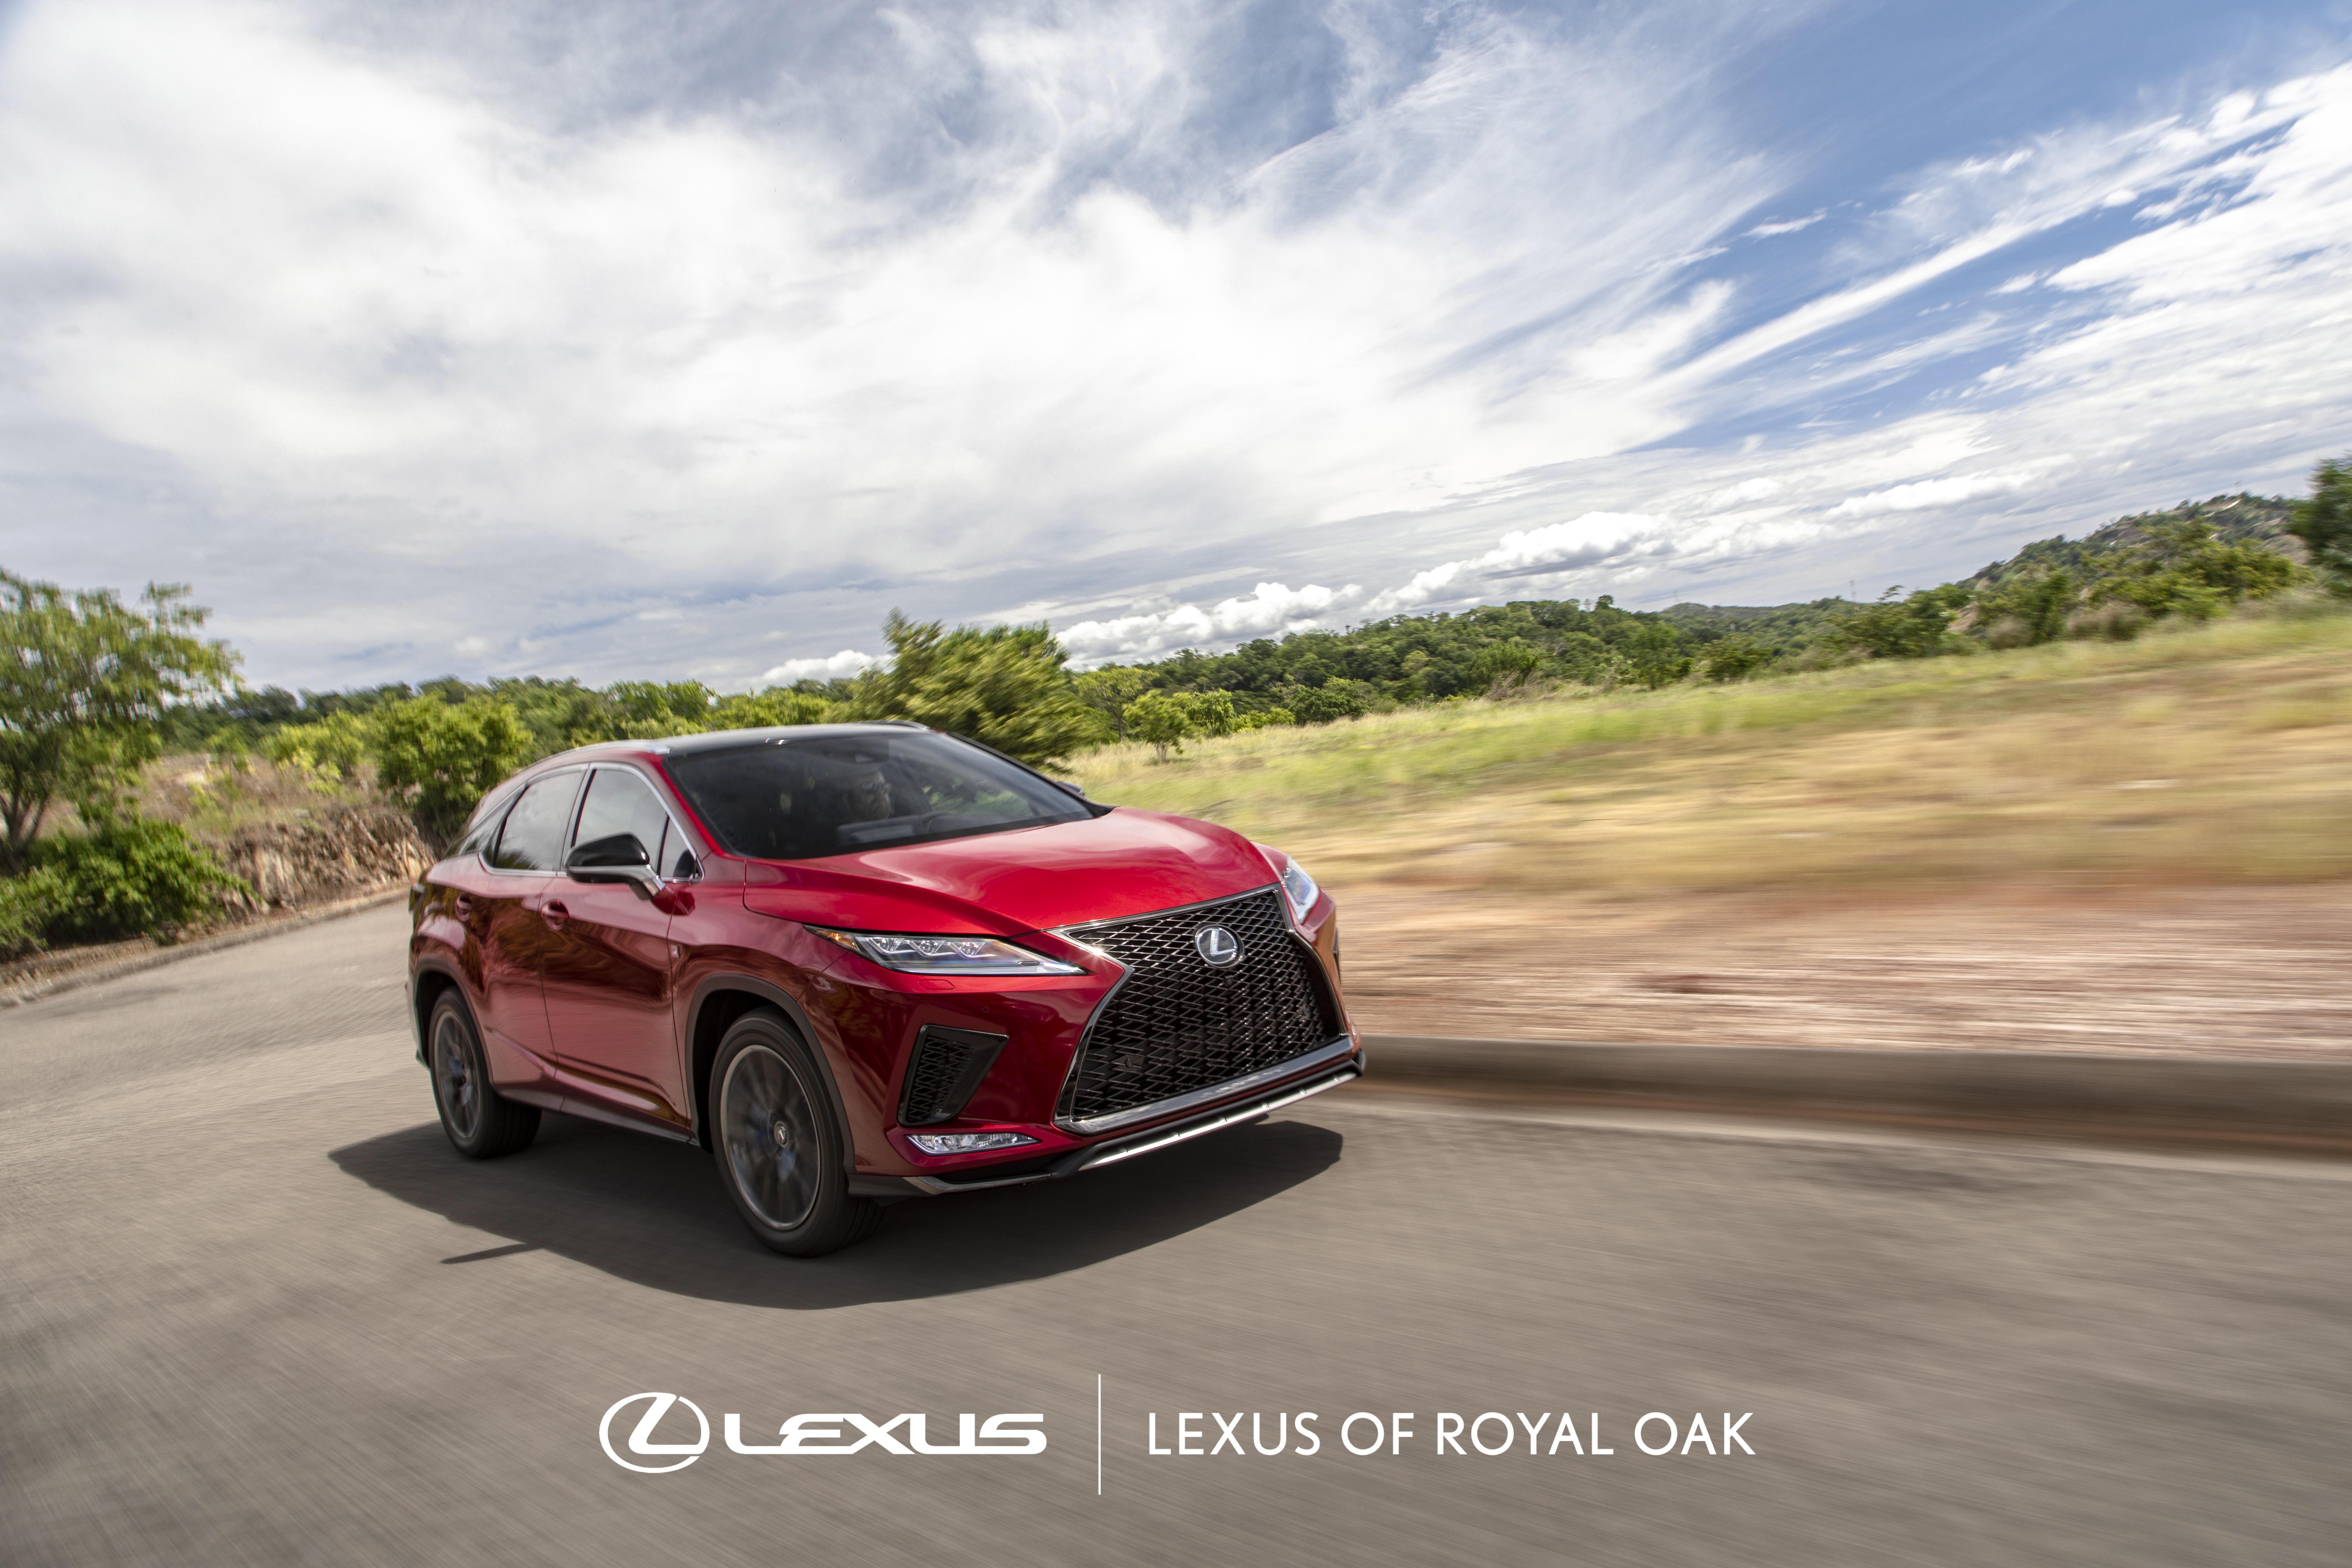 2020 Lexus RX in 2020 Lexus rx 350, Lexus models, Lexus cars